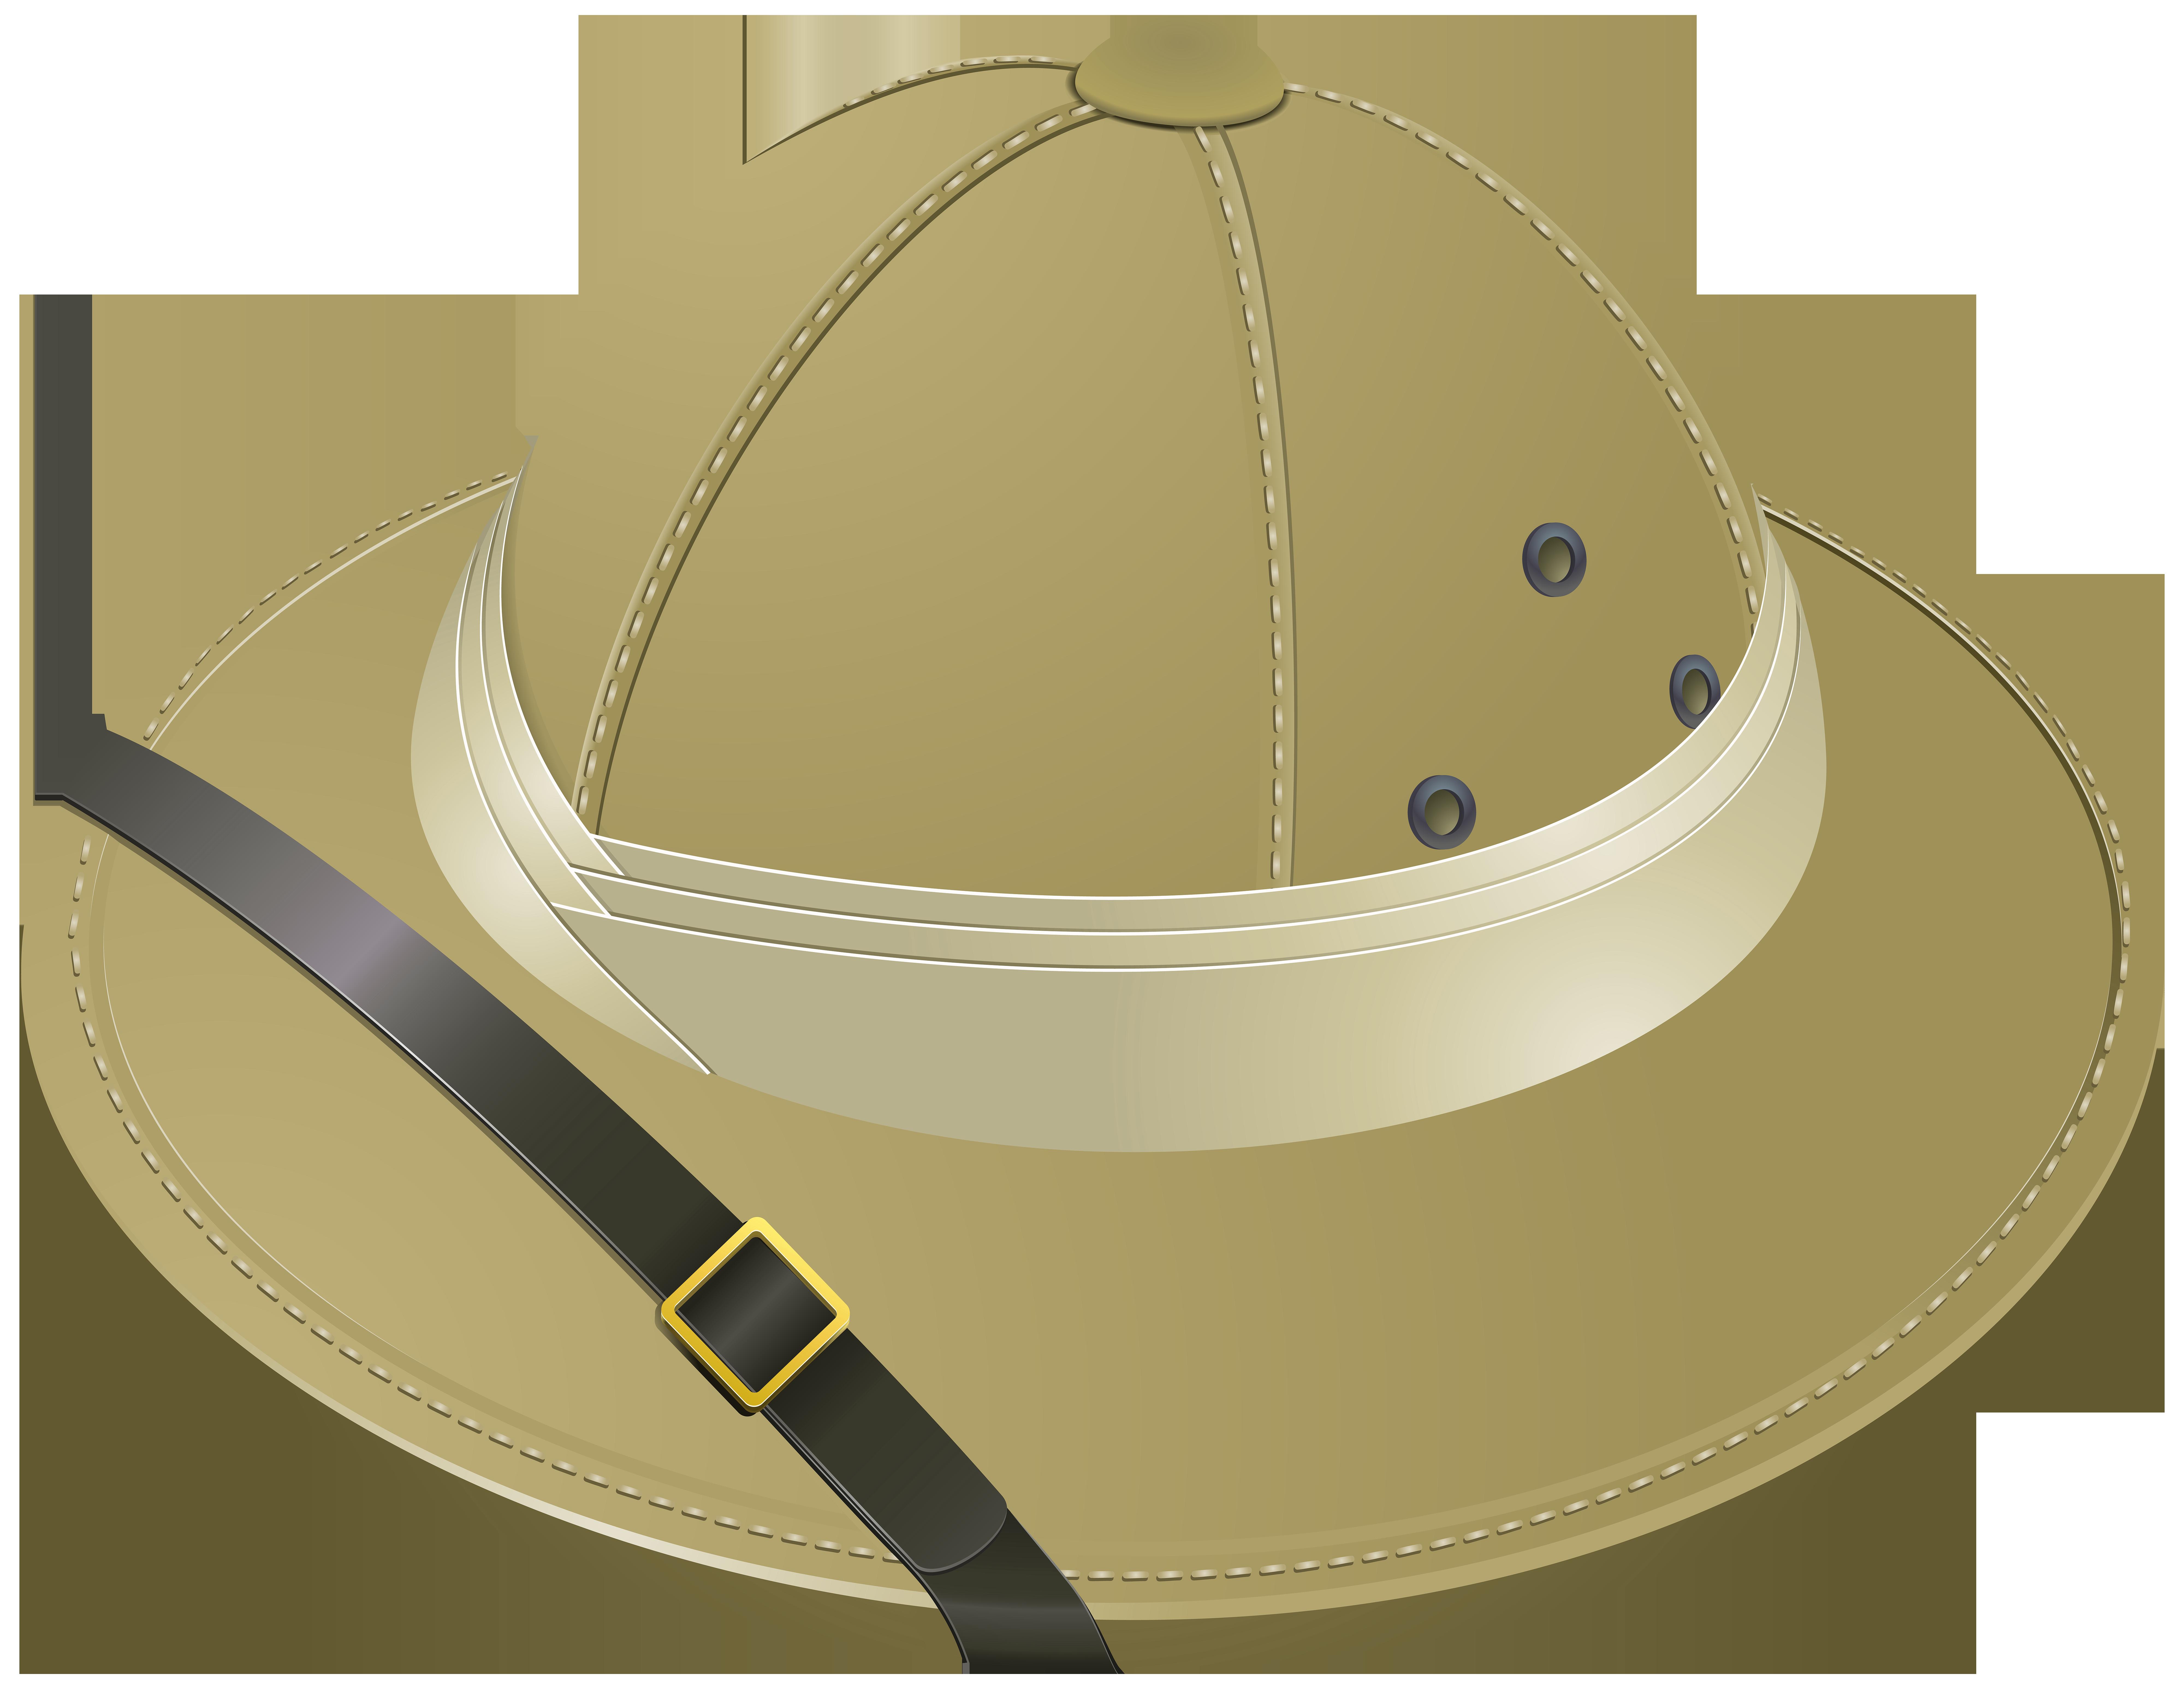 Pith Helmet Transparent PNG Clip Art Image.